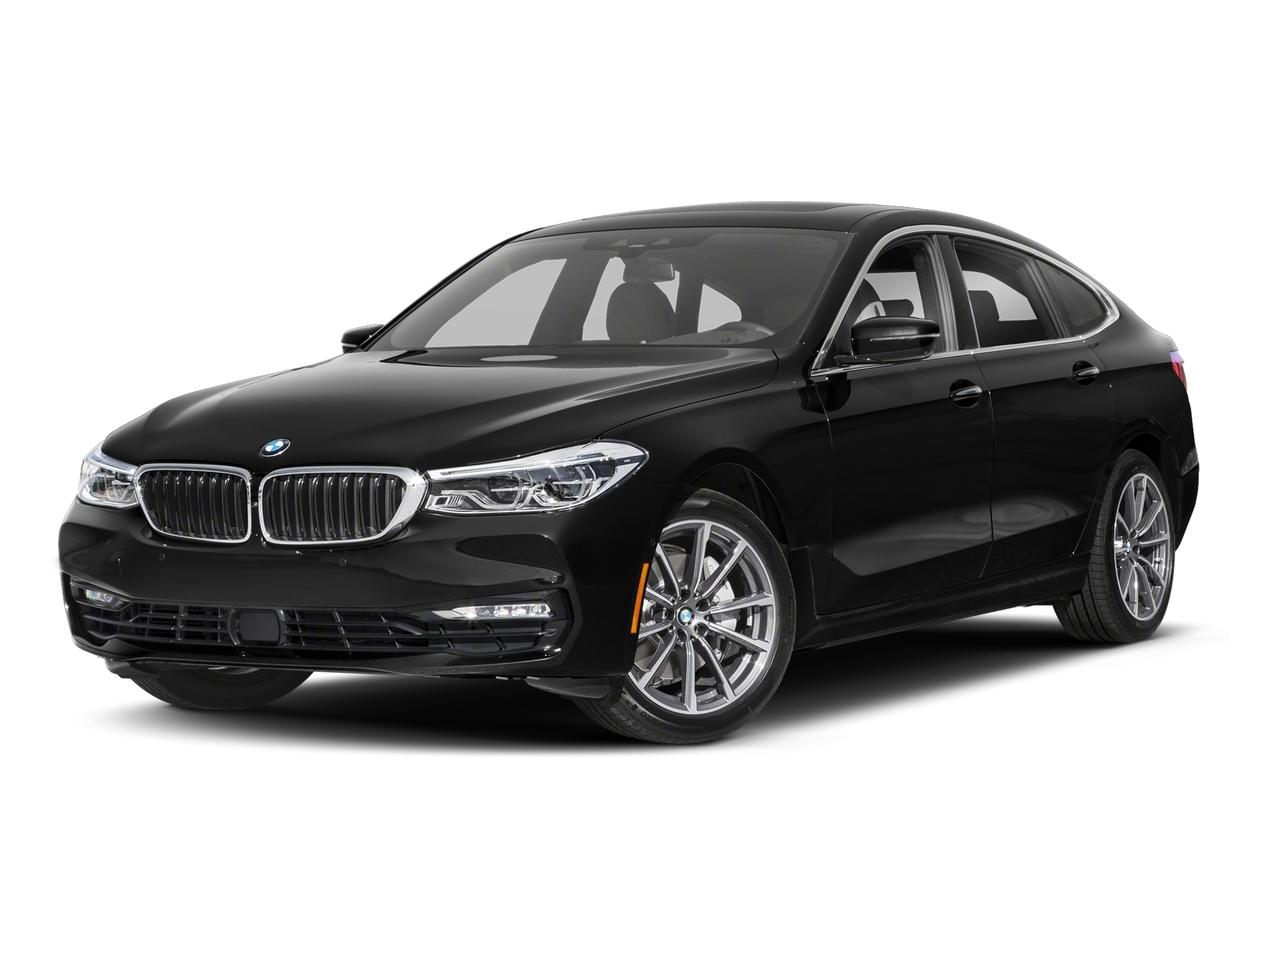 2018 BMW 640i xDrive Vehicle Photo in Temple, TX 76502